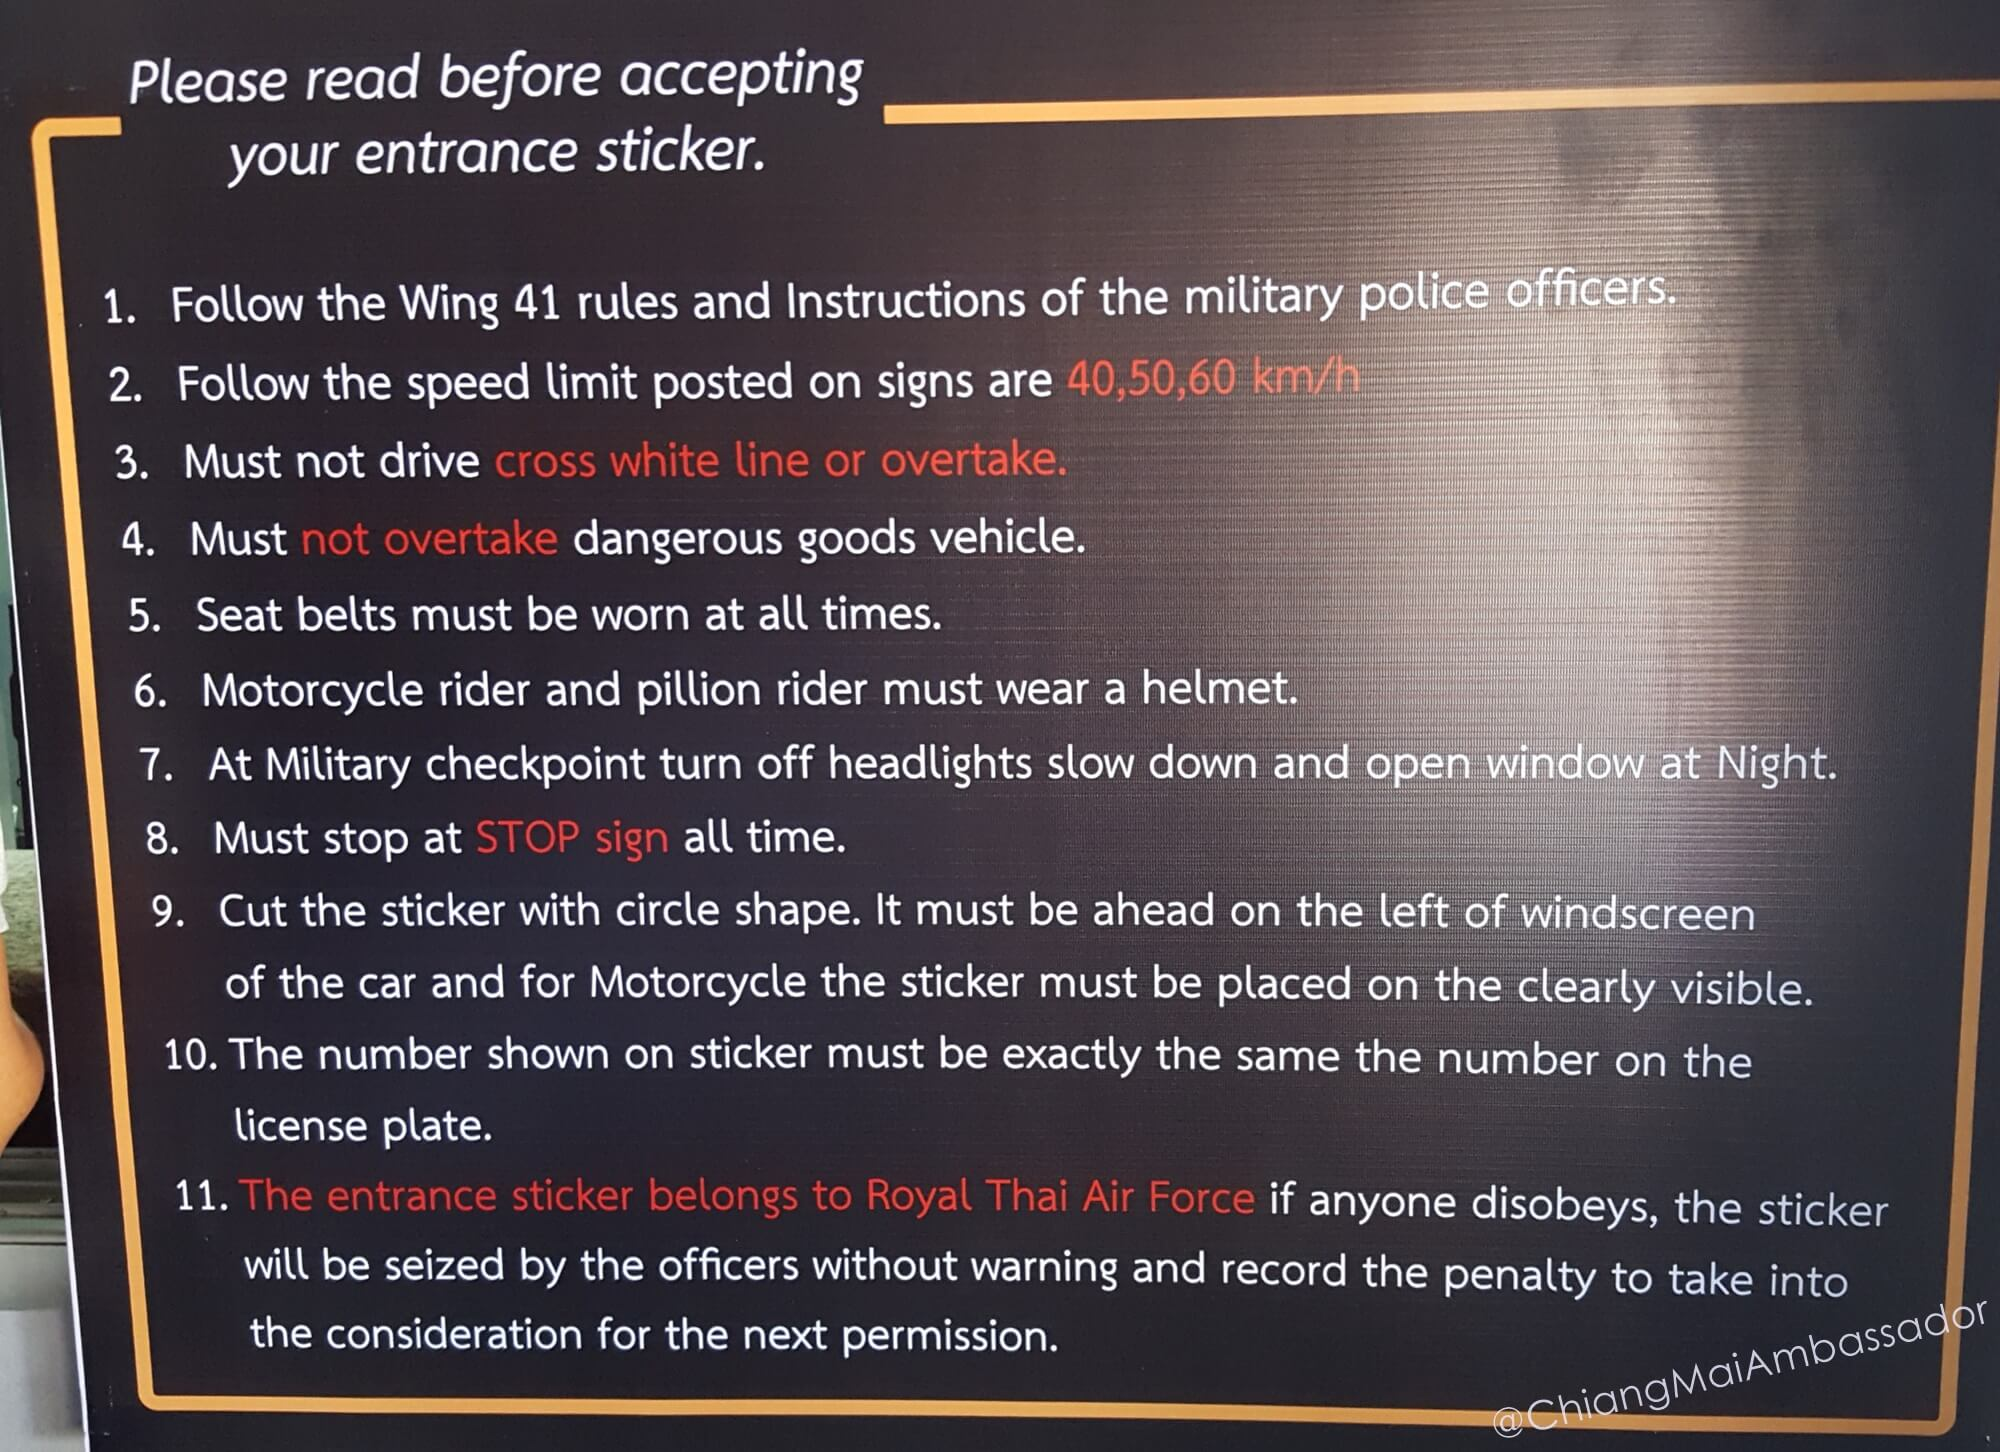 Chiang Mai Ambassador Wing 41 Pass Rules